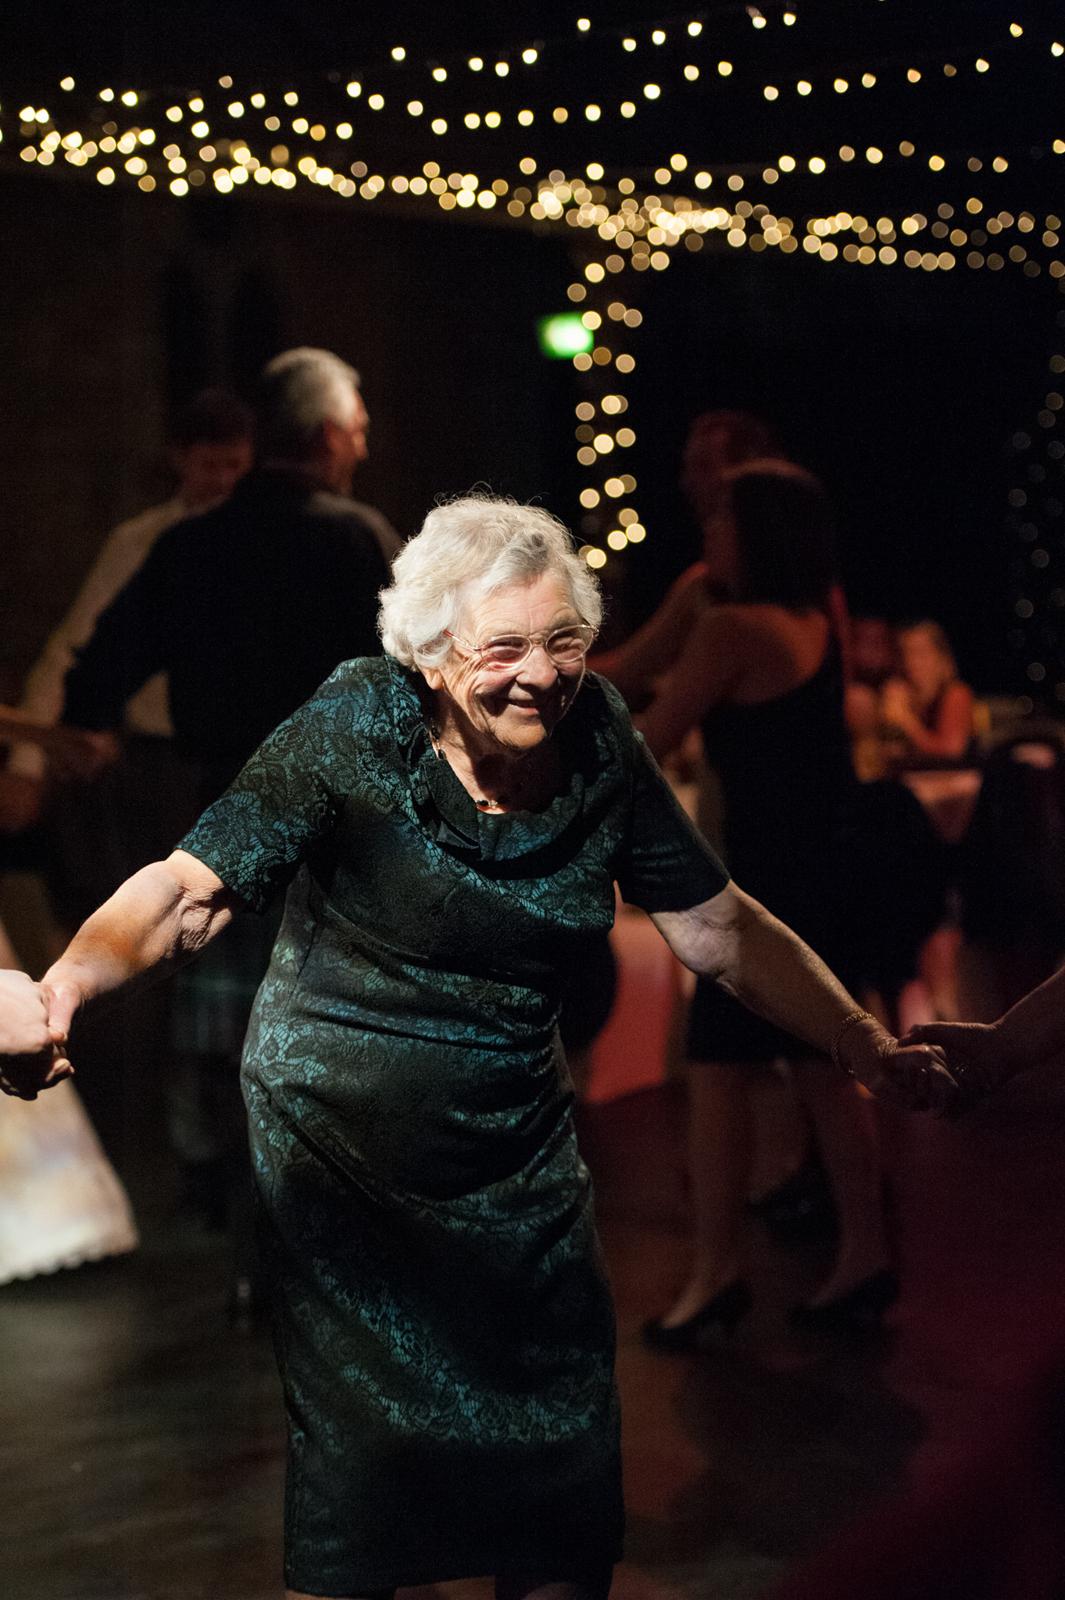 dancing-wedding-granny-cottiers-glasgow.jpg